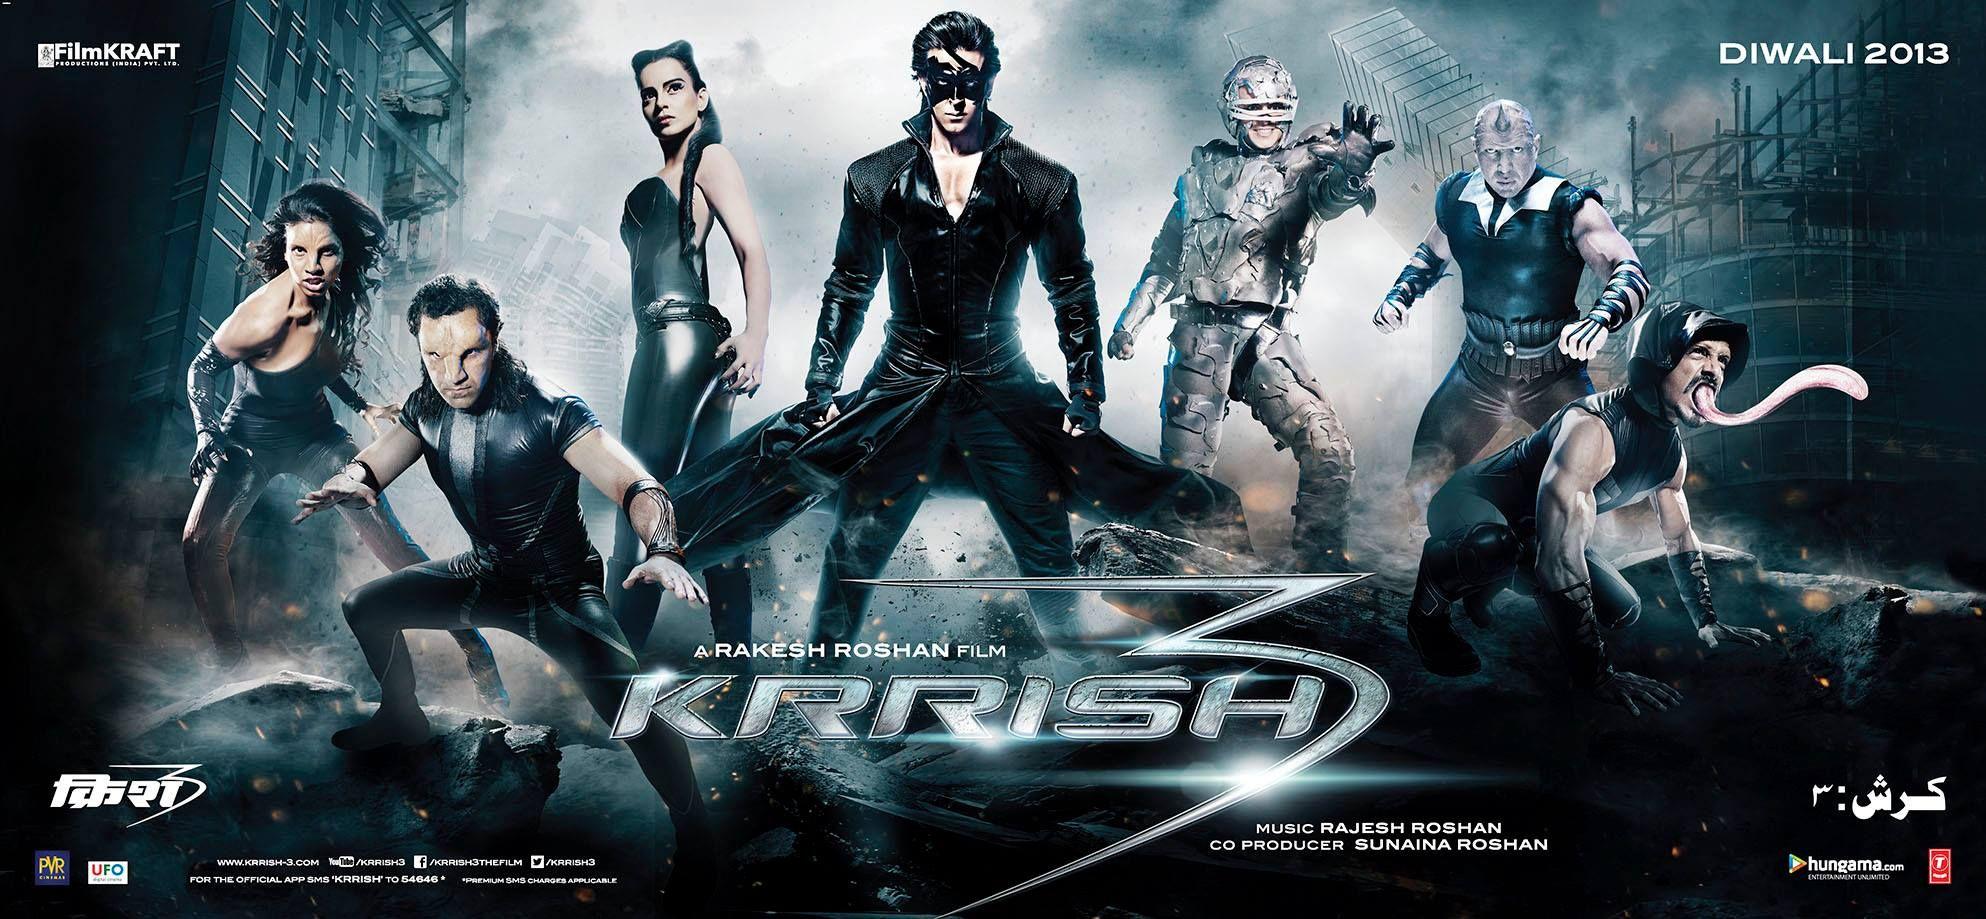 Krrish Hindi Movie Google Search Krrish 3 Bollywood Posters 3 Movie